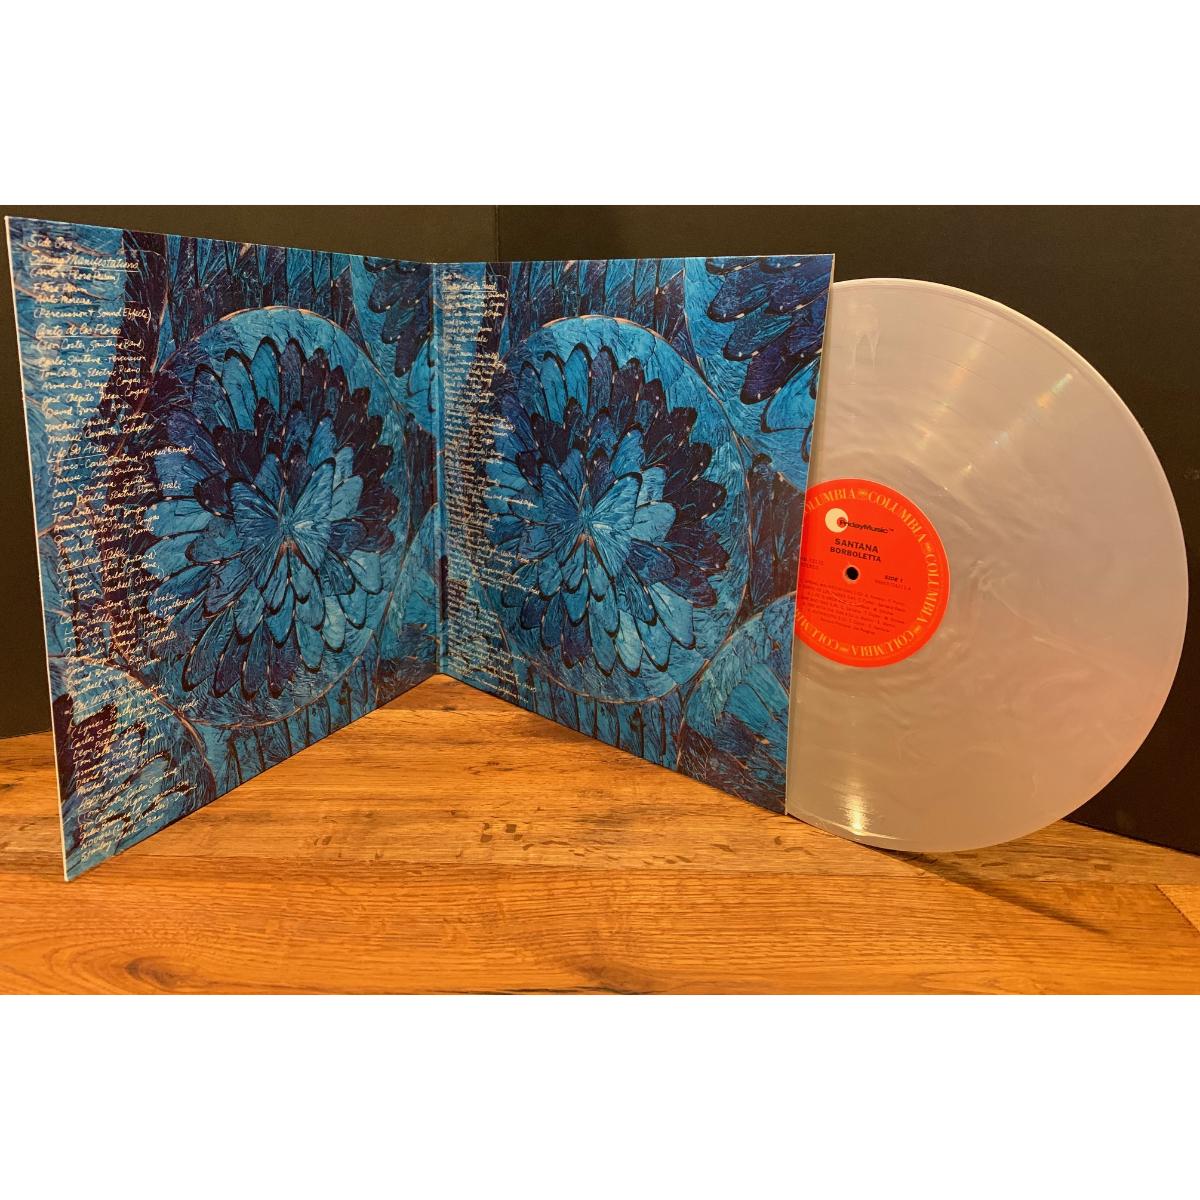 Santana - Borboletta (180 Gram Platinum Swirl Audiophile Vinyl/45th Anniversary Limited Edition/Gatefold Cover)